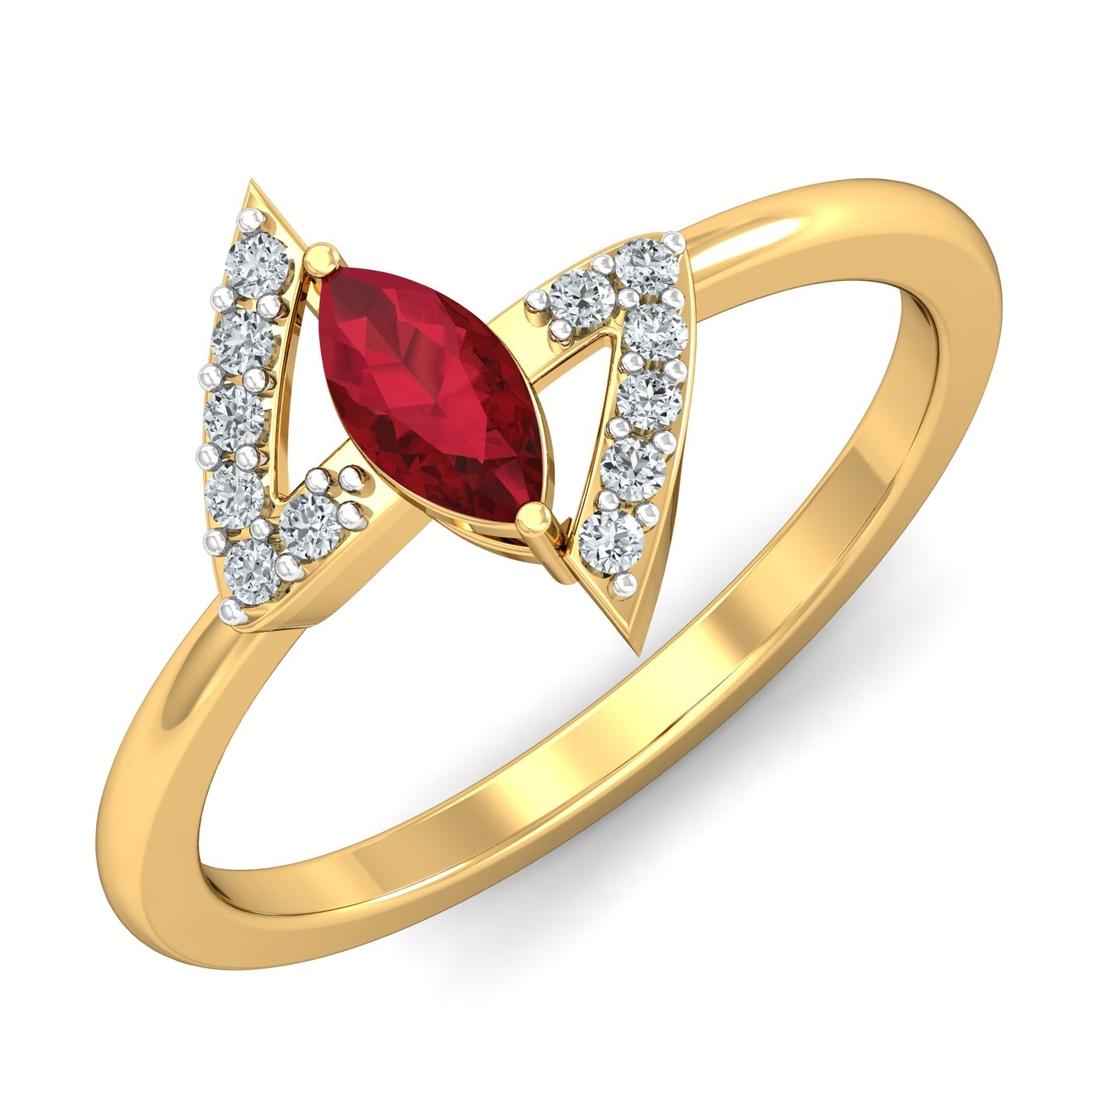 Arkina Diamond's Red Stone fashion ring